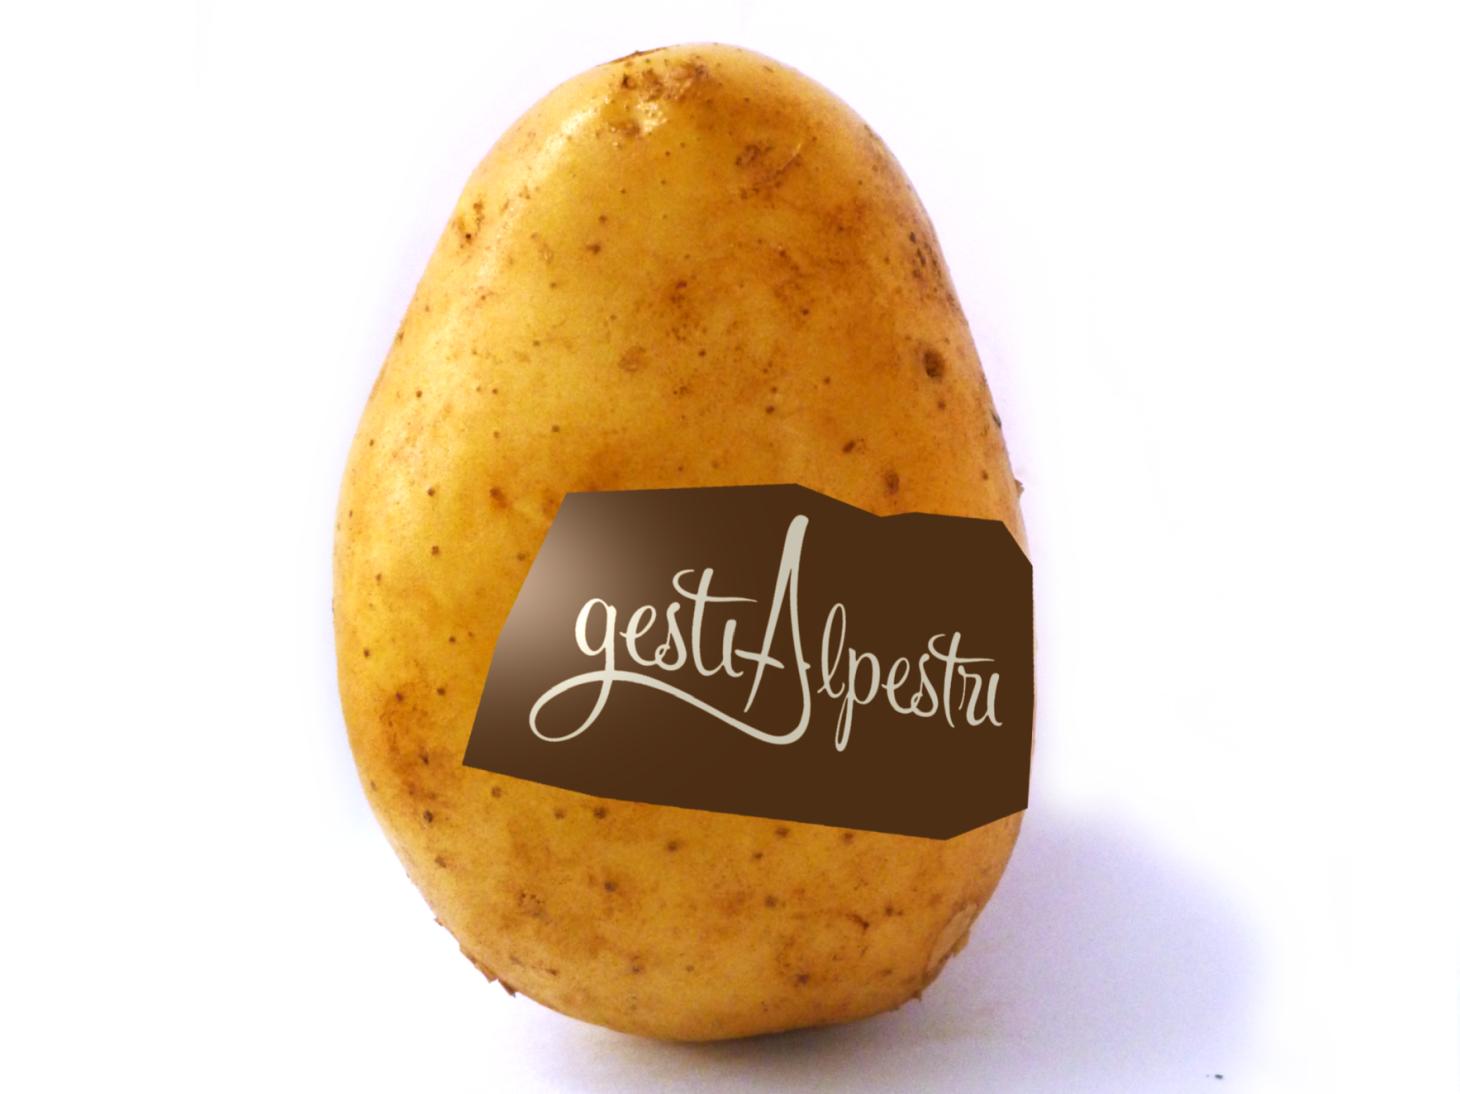 La Patata GestiAlpestri